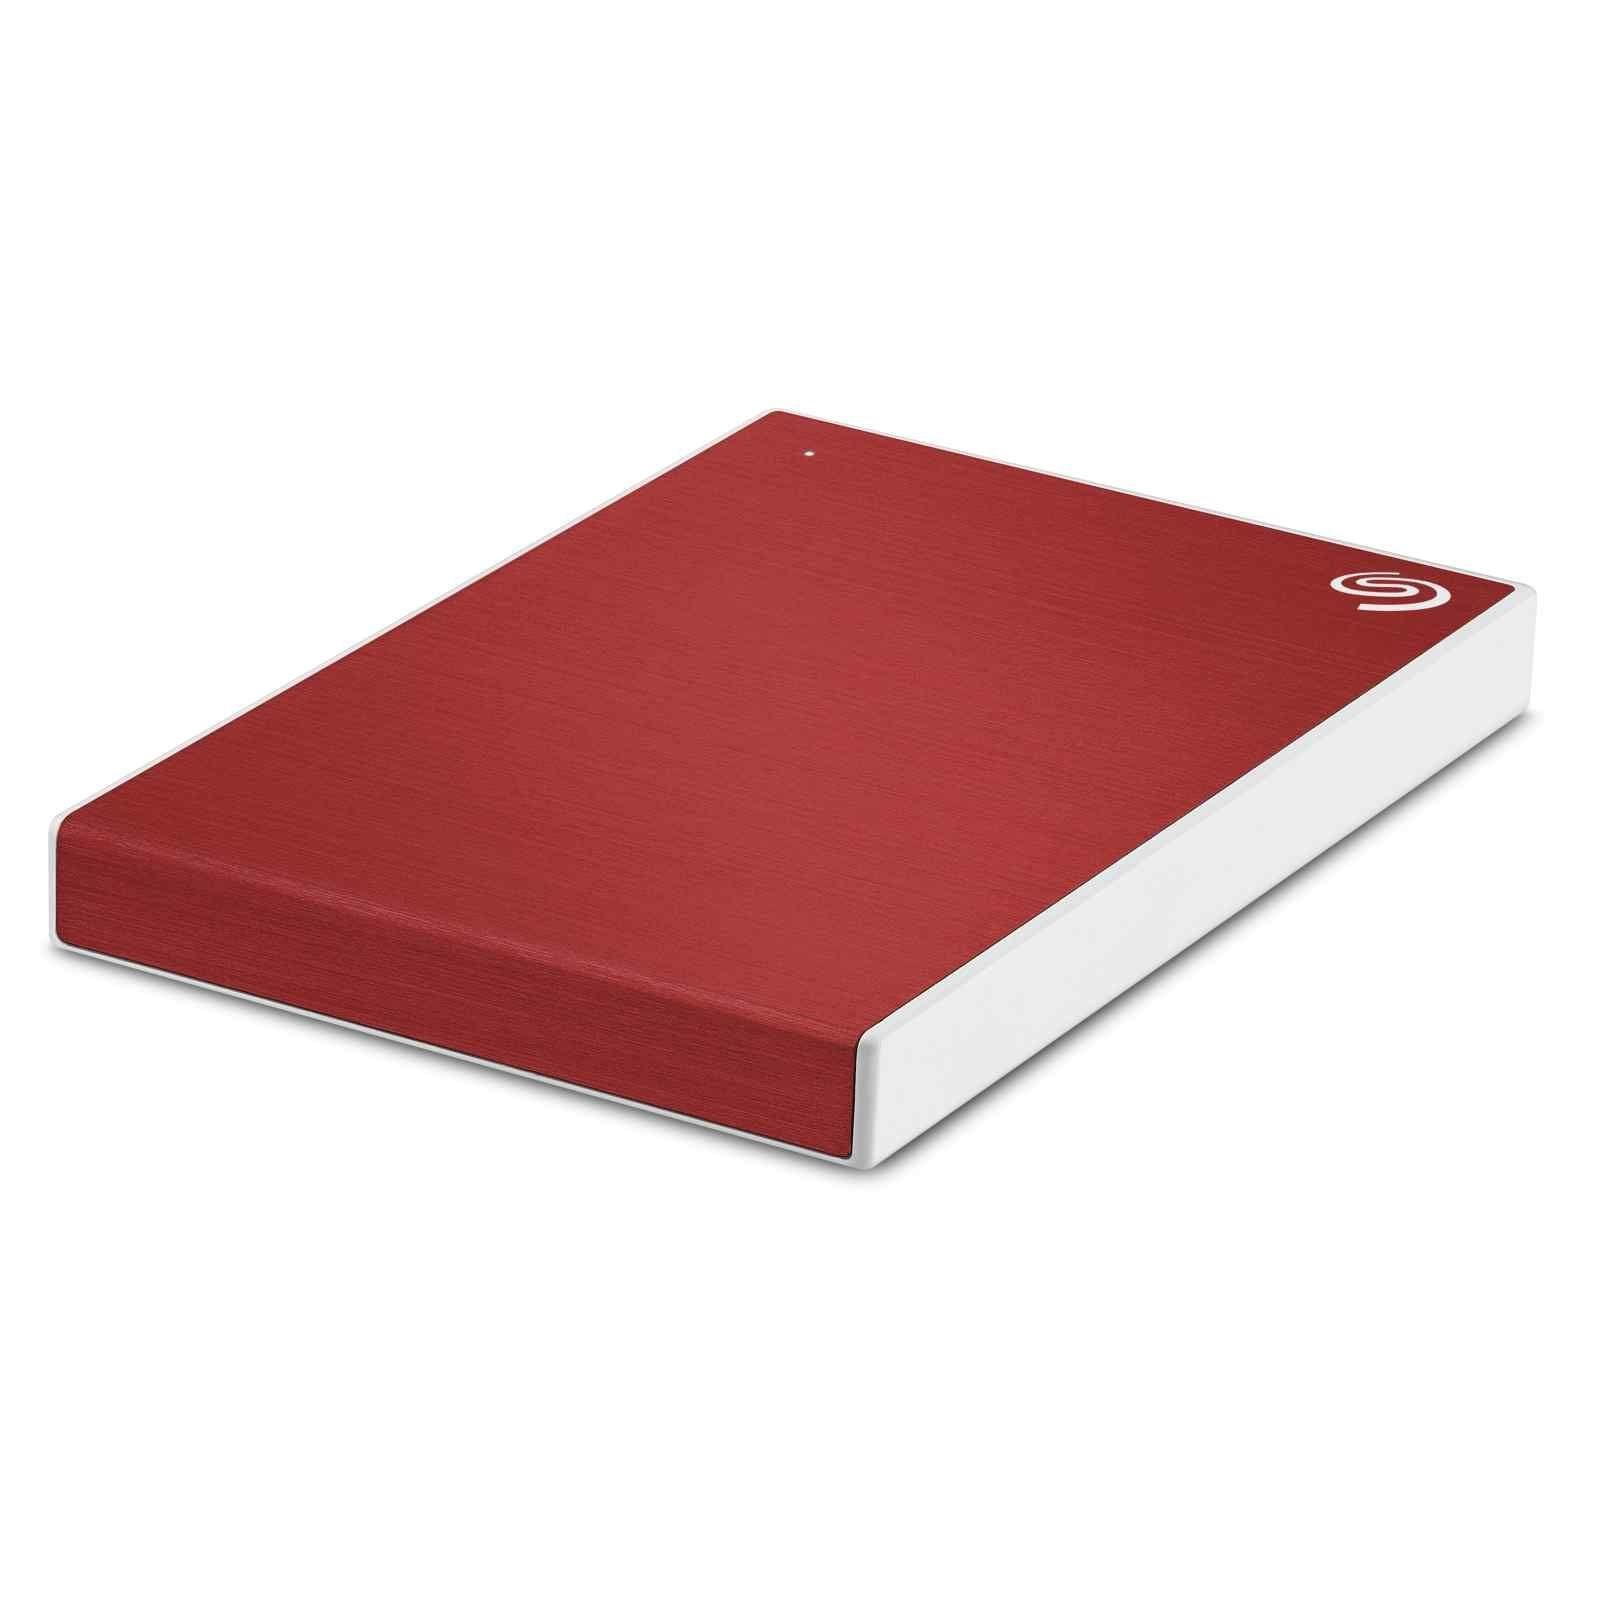 Внешний жесткий диск Seagate Backup Plus STHP5000403 5Tb USB 3.0/2.5